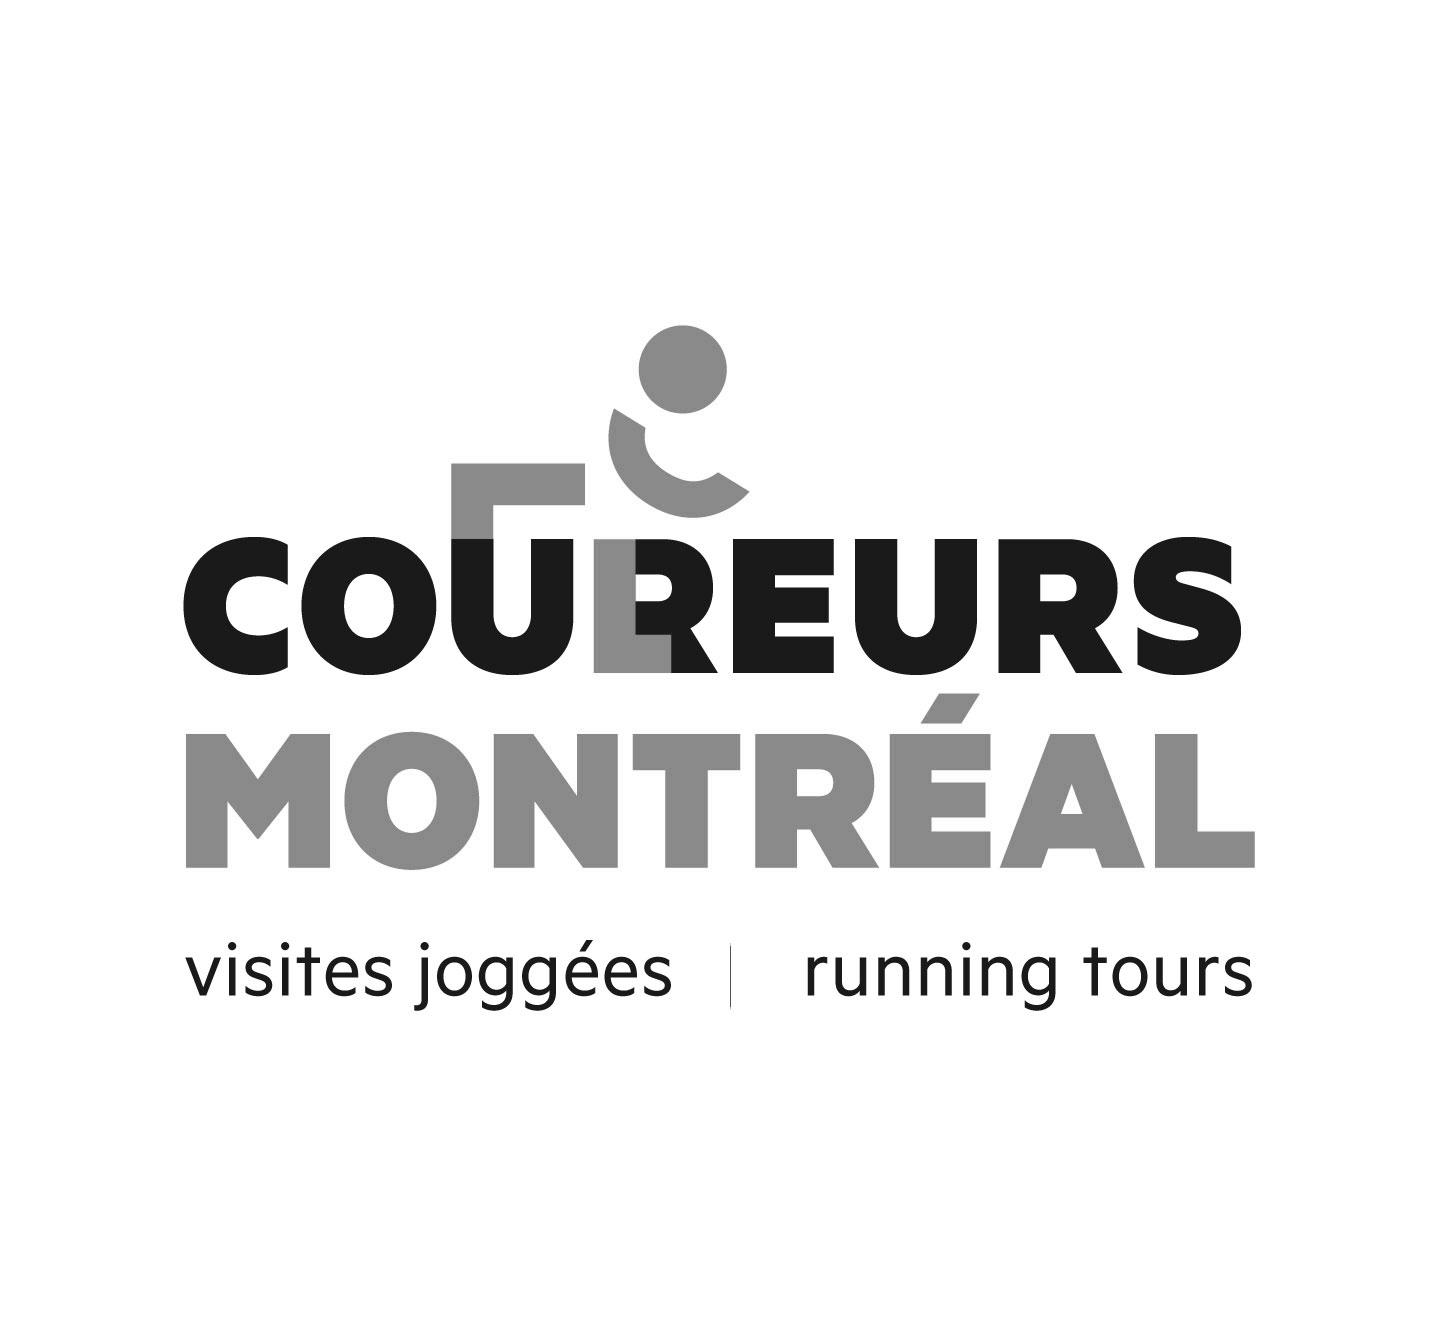 Coureurs Montréal